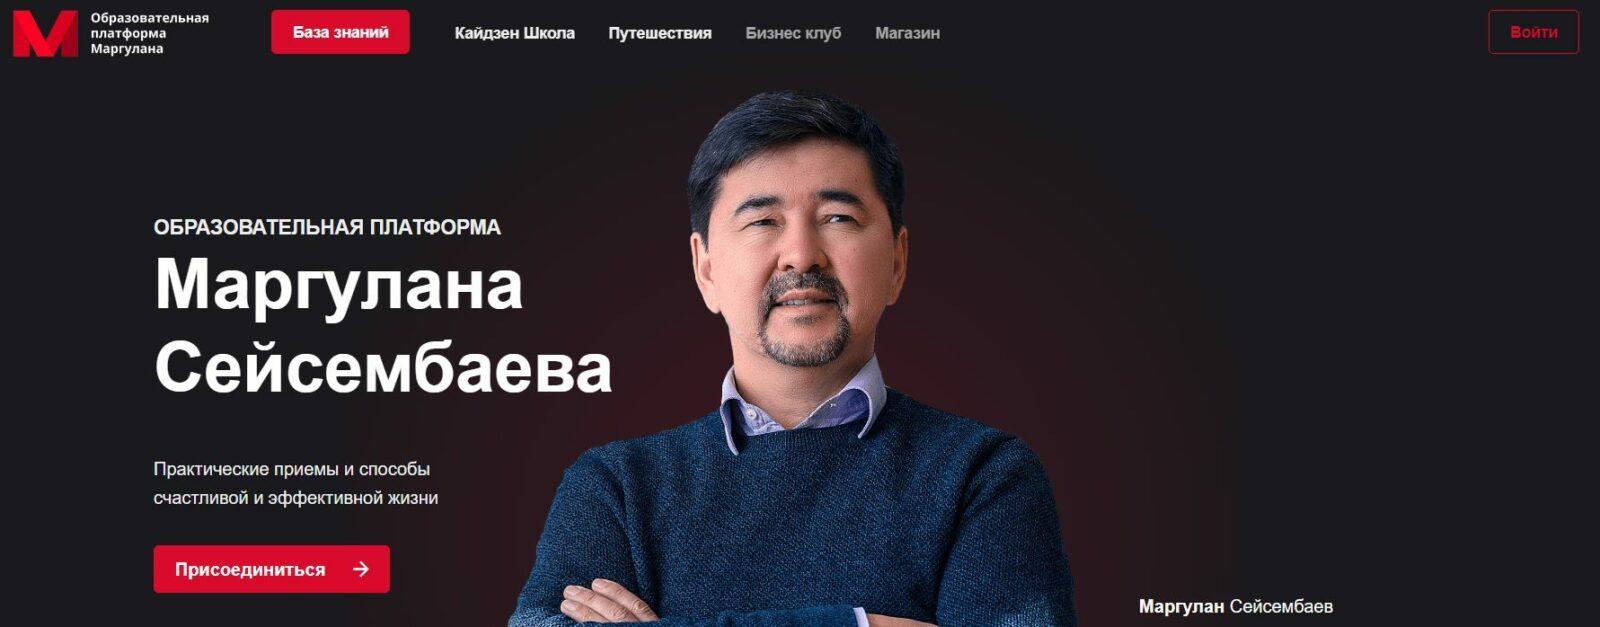 Официальный сайт миллиардера Маргулана Сейсембаева